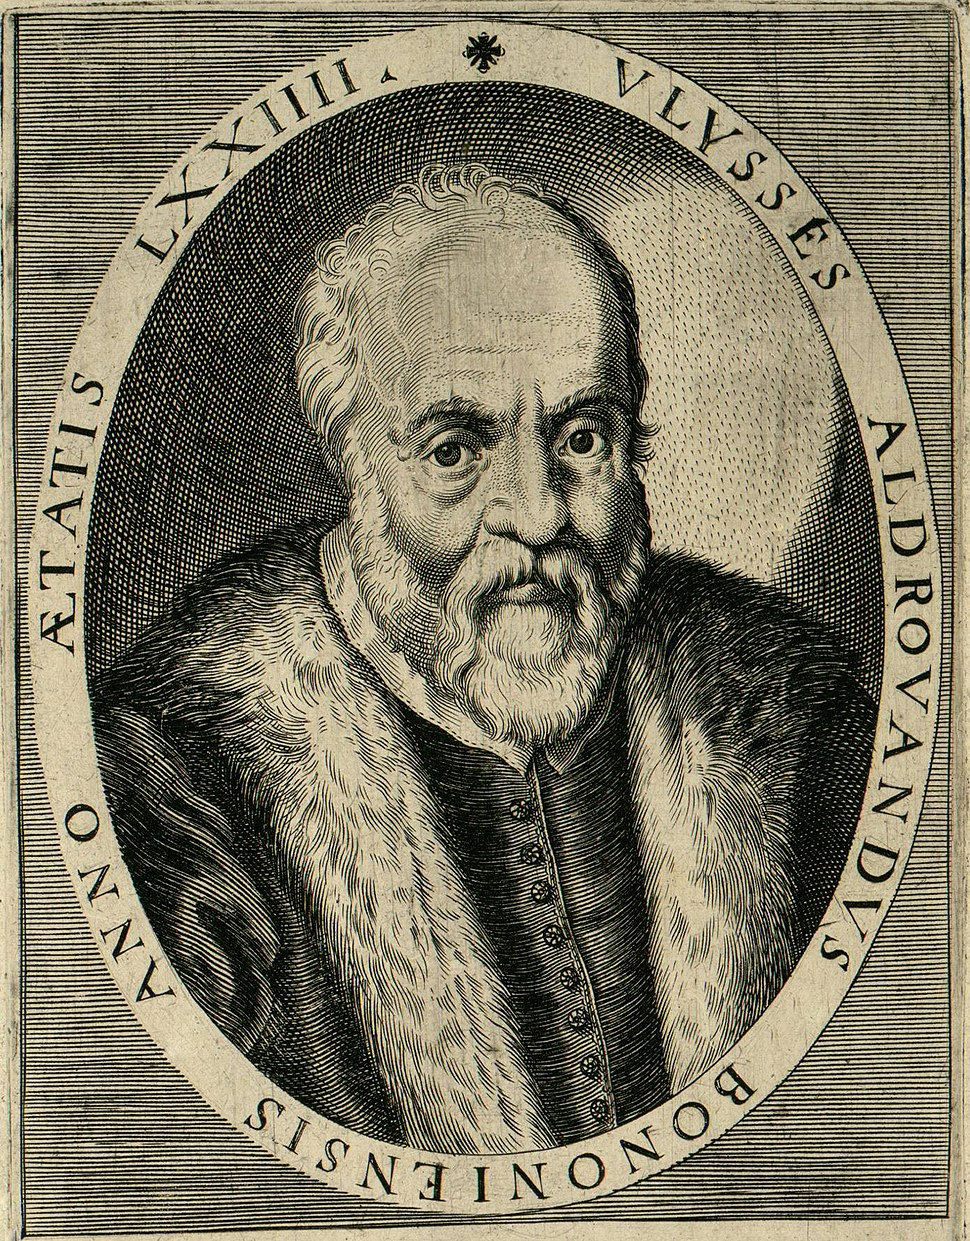 Aldrovandi 1522-1605